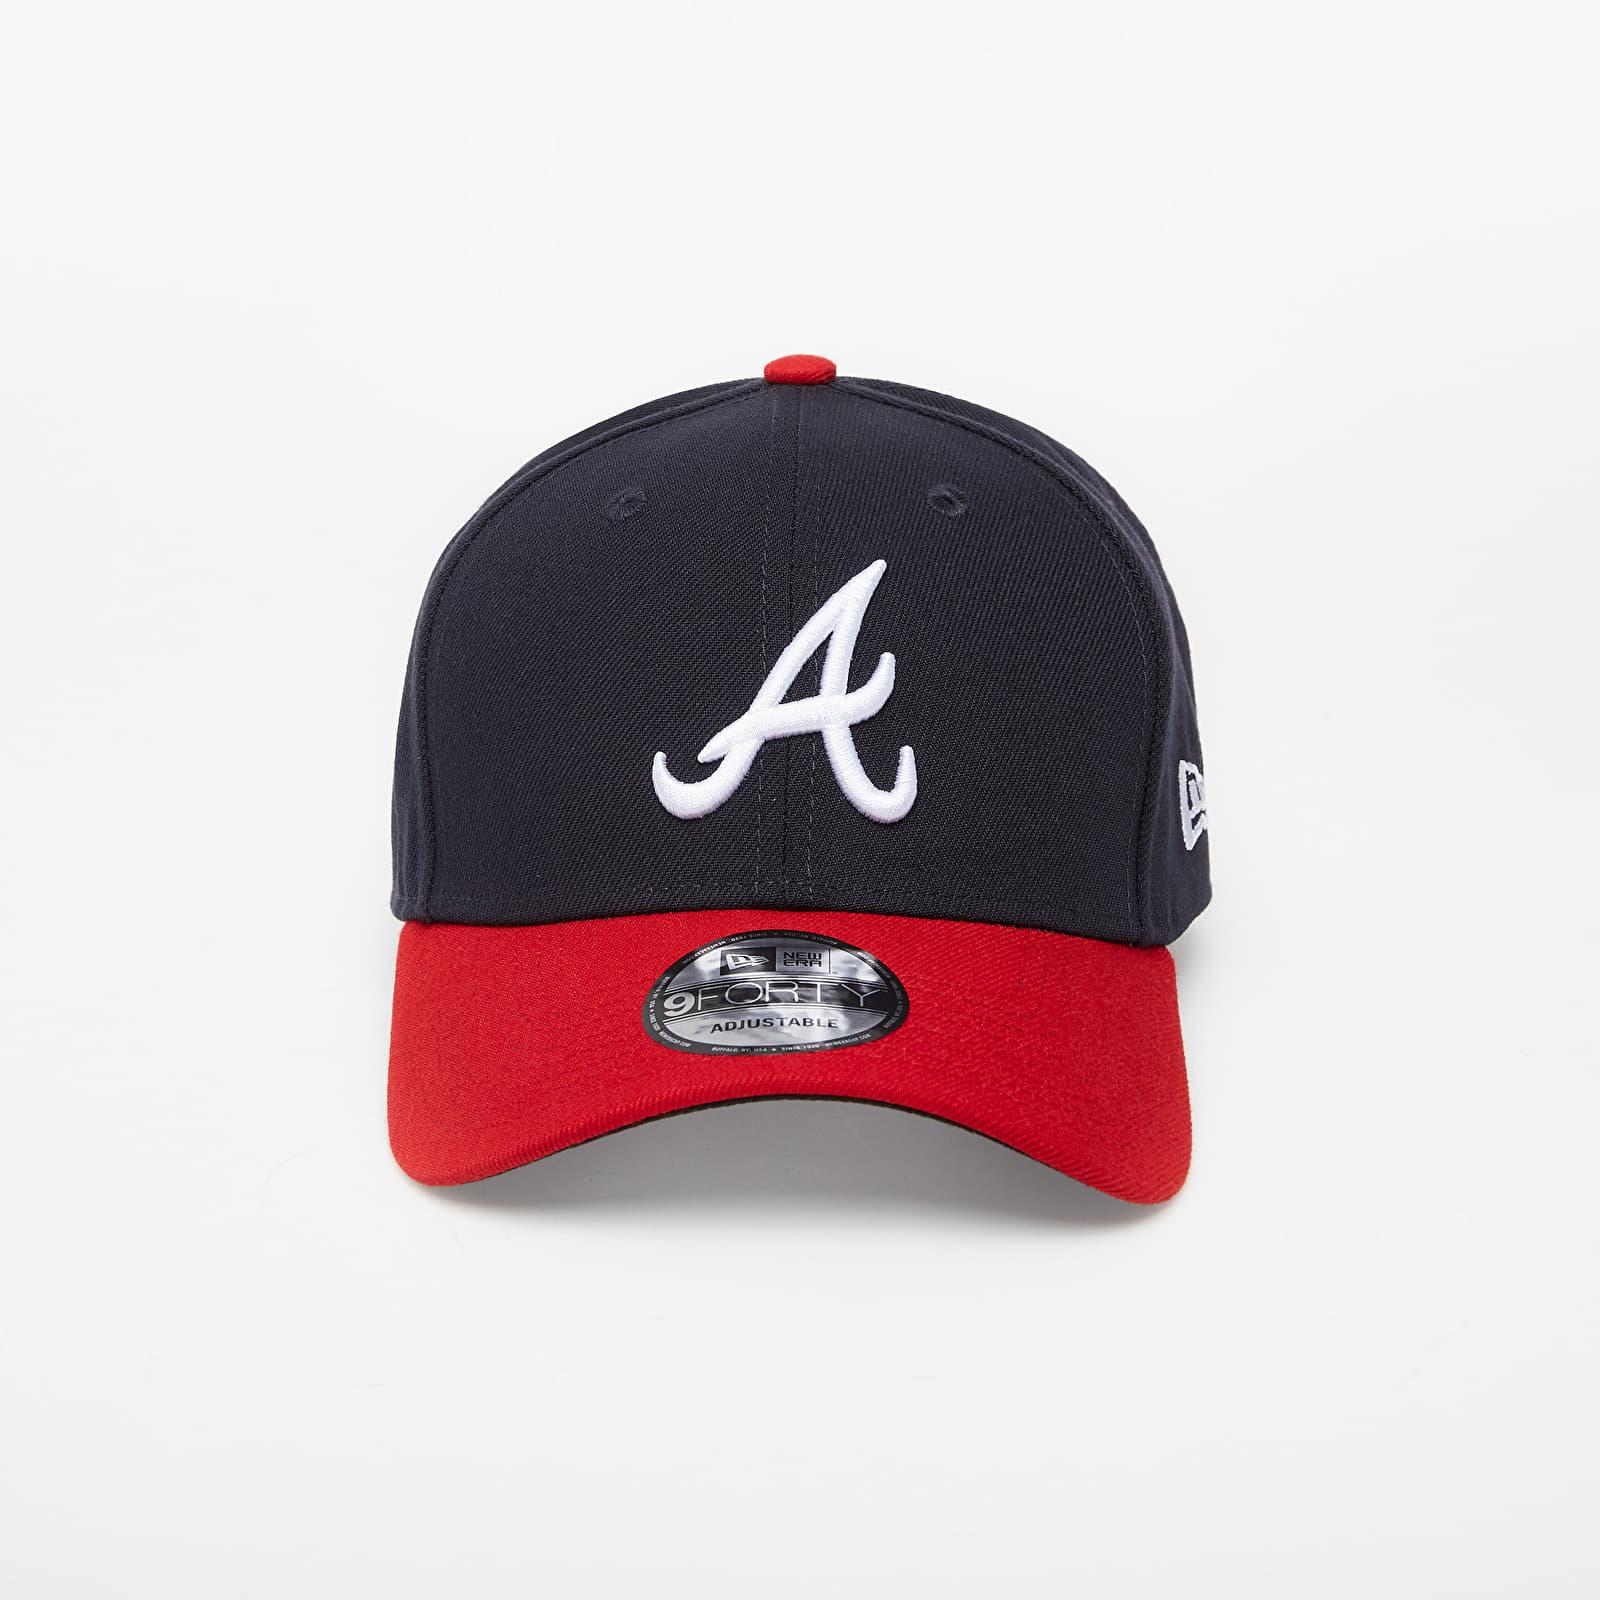 Caps New Era 9Forty The League Atlanta Braves Cap Navy